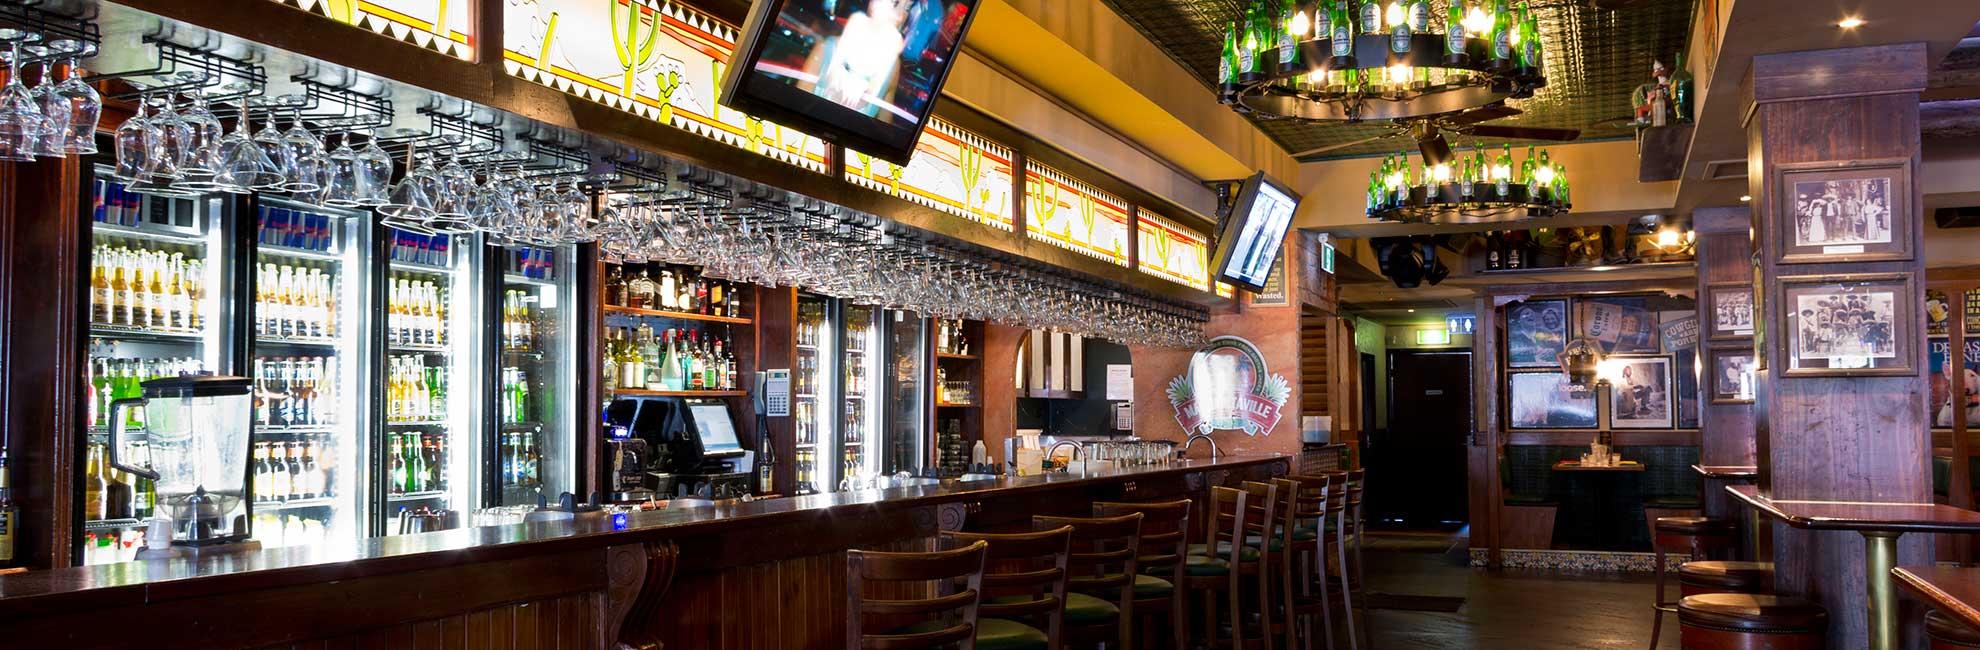 bars-dining